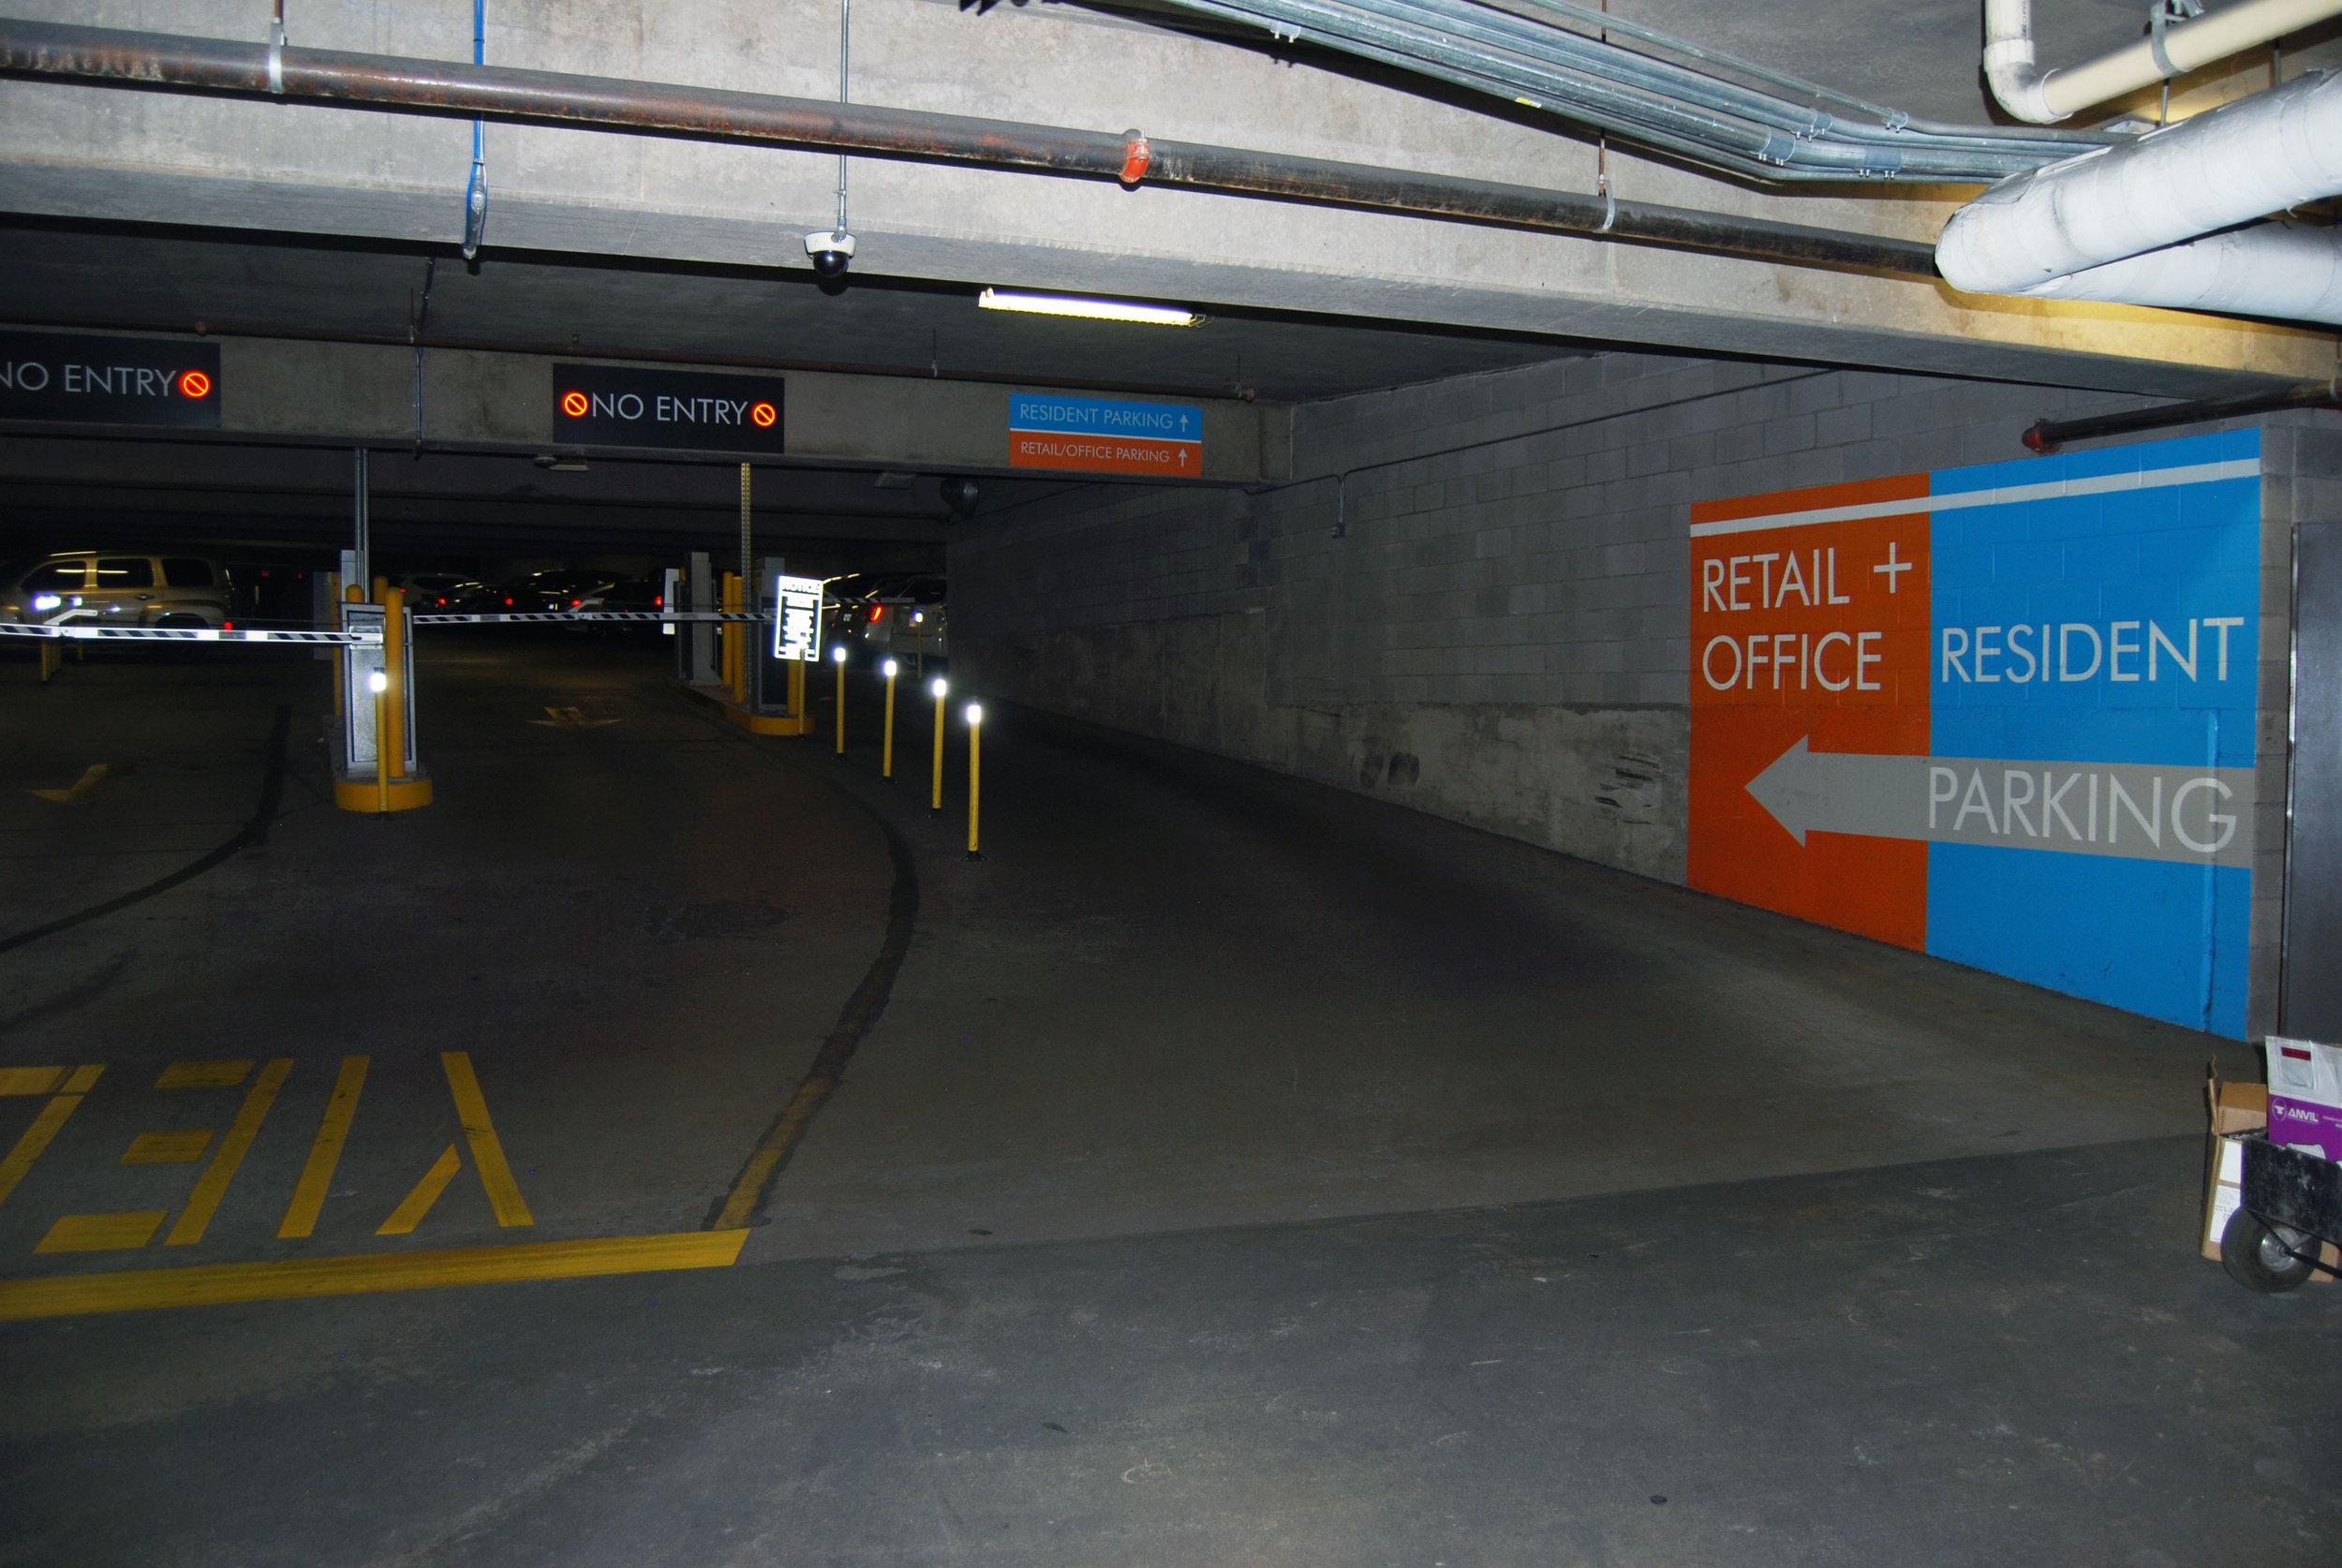 Park Plaza Retail Gate.JPG